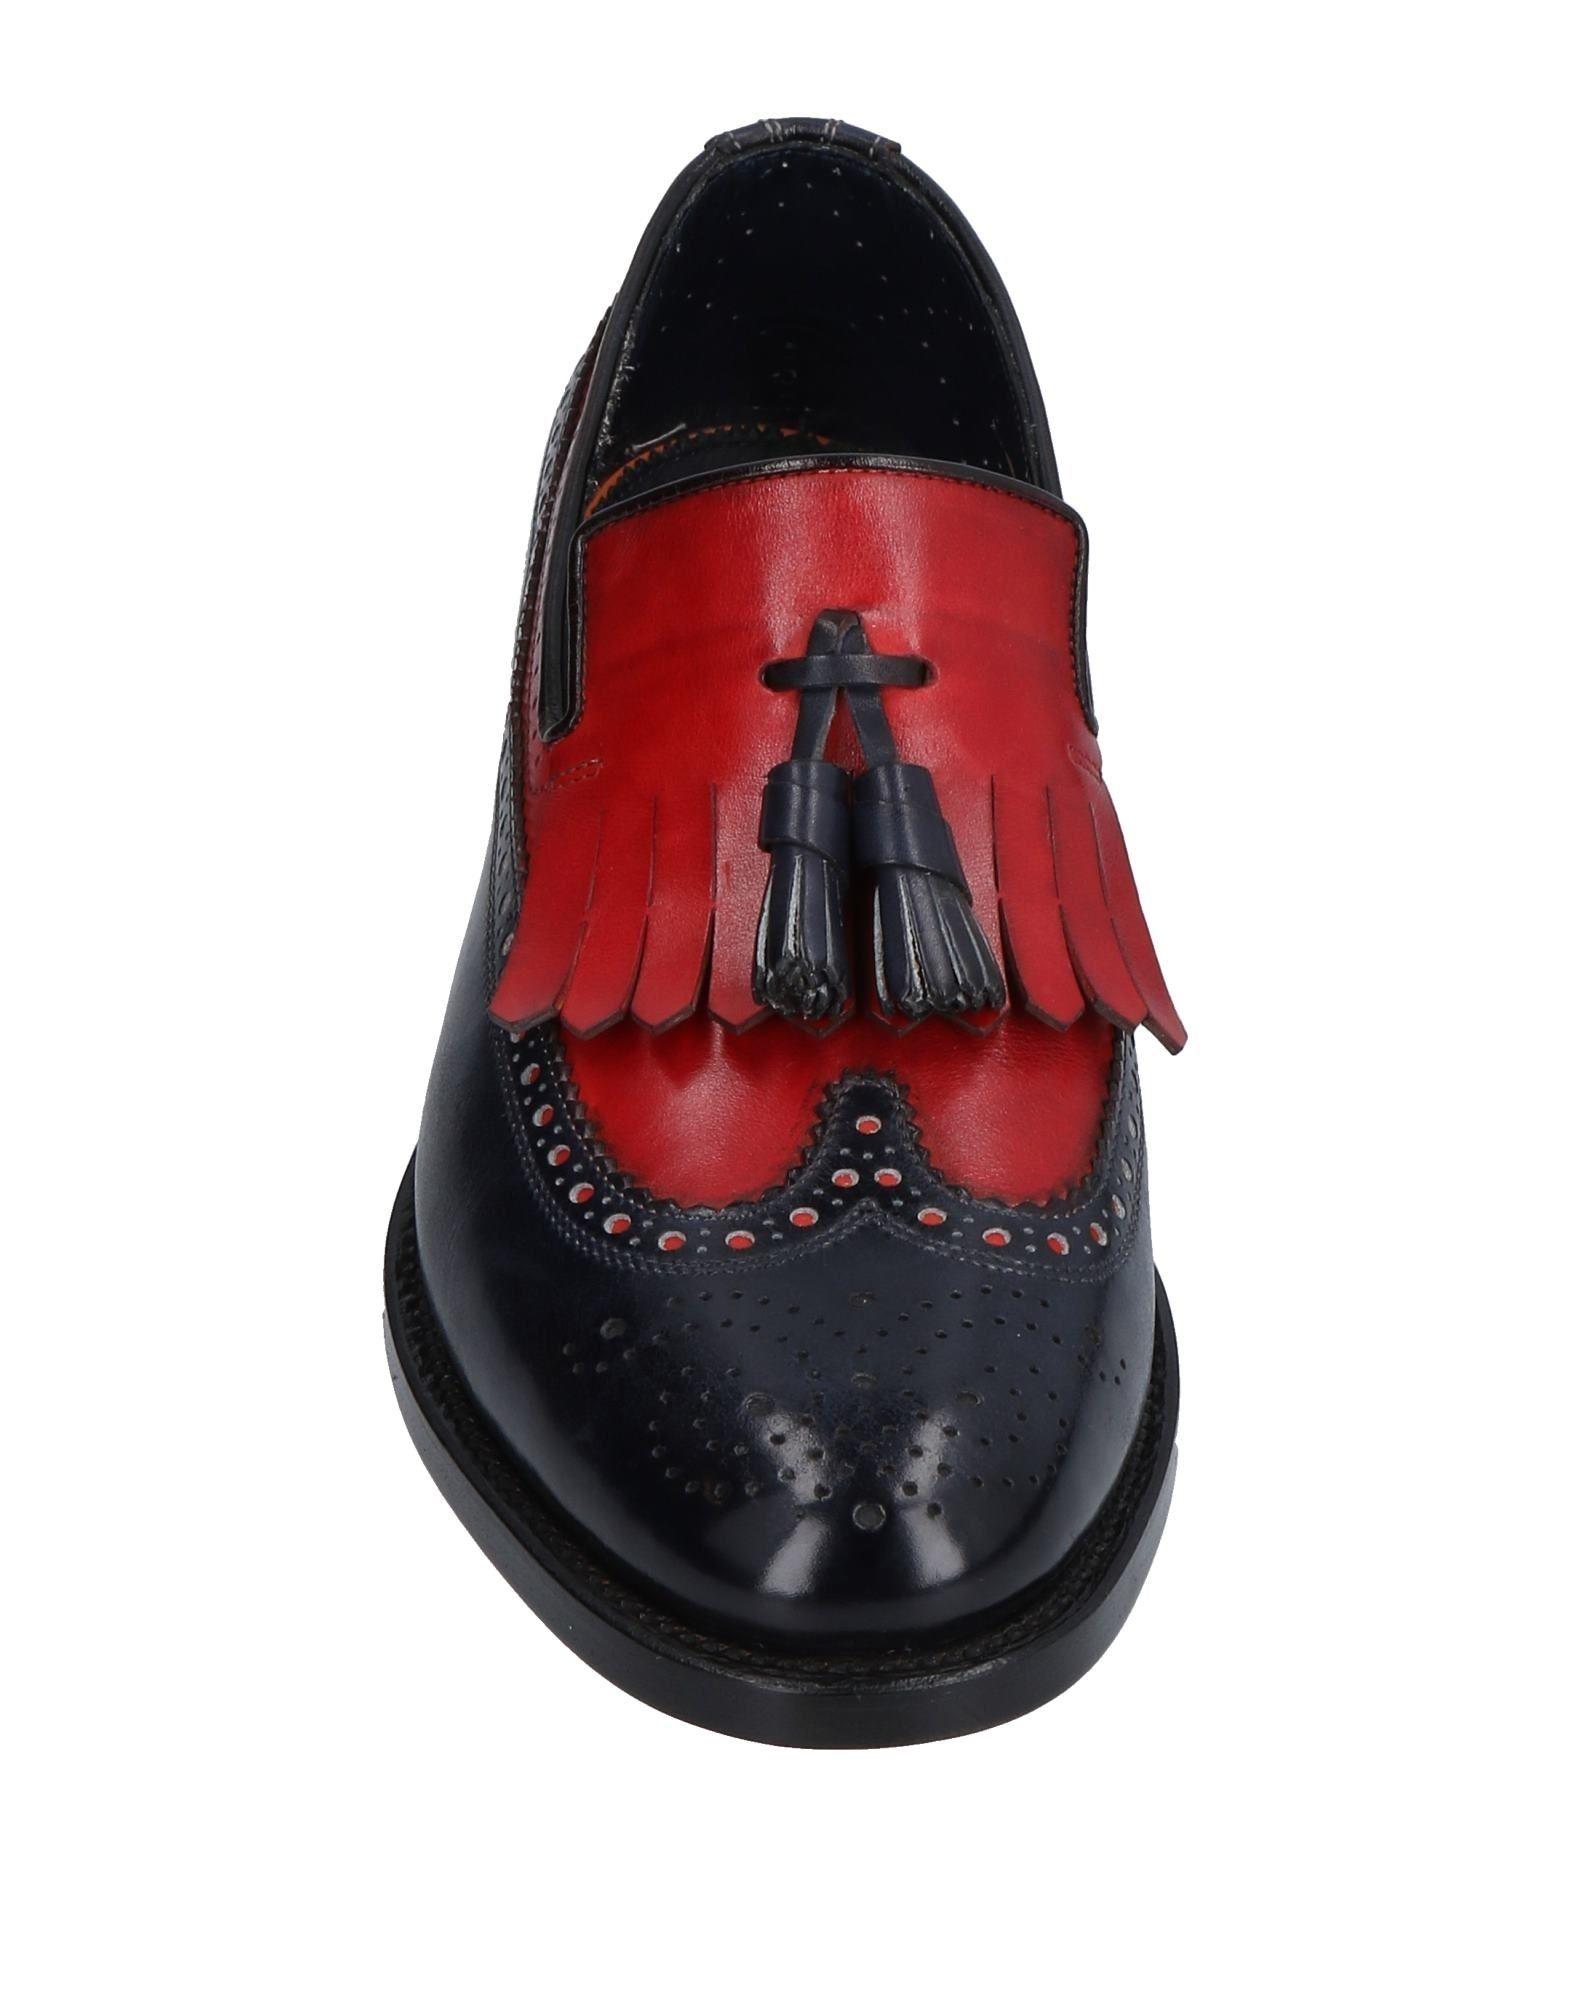 Santoni Mokassins Herren beliebte  11506071LS Gute Qualität beliebte Herren Schuhe 7bd426